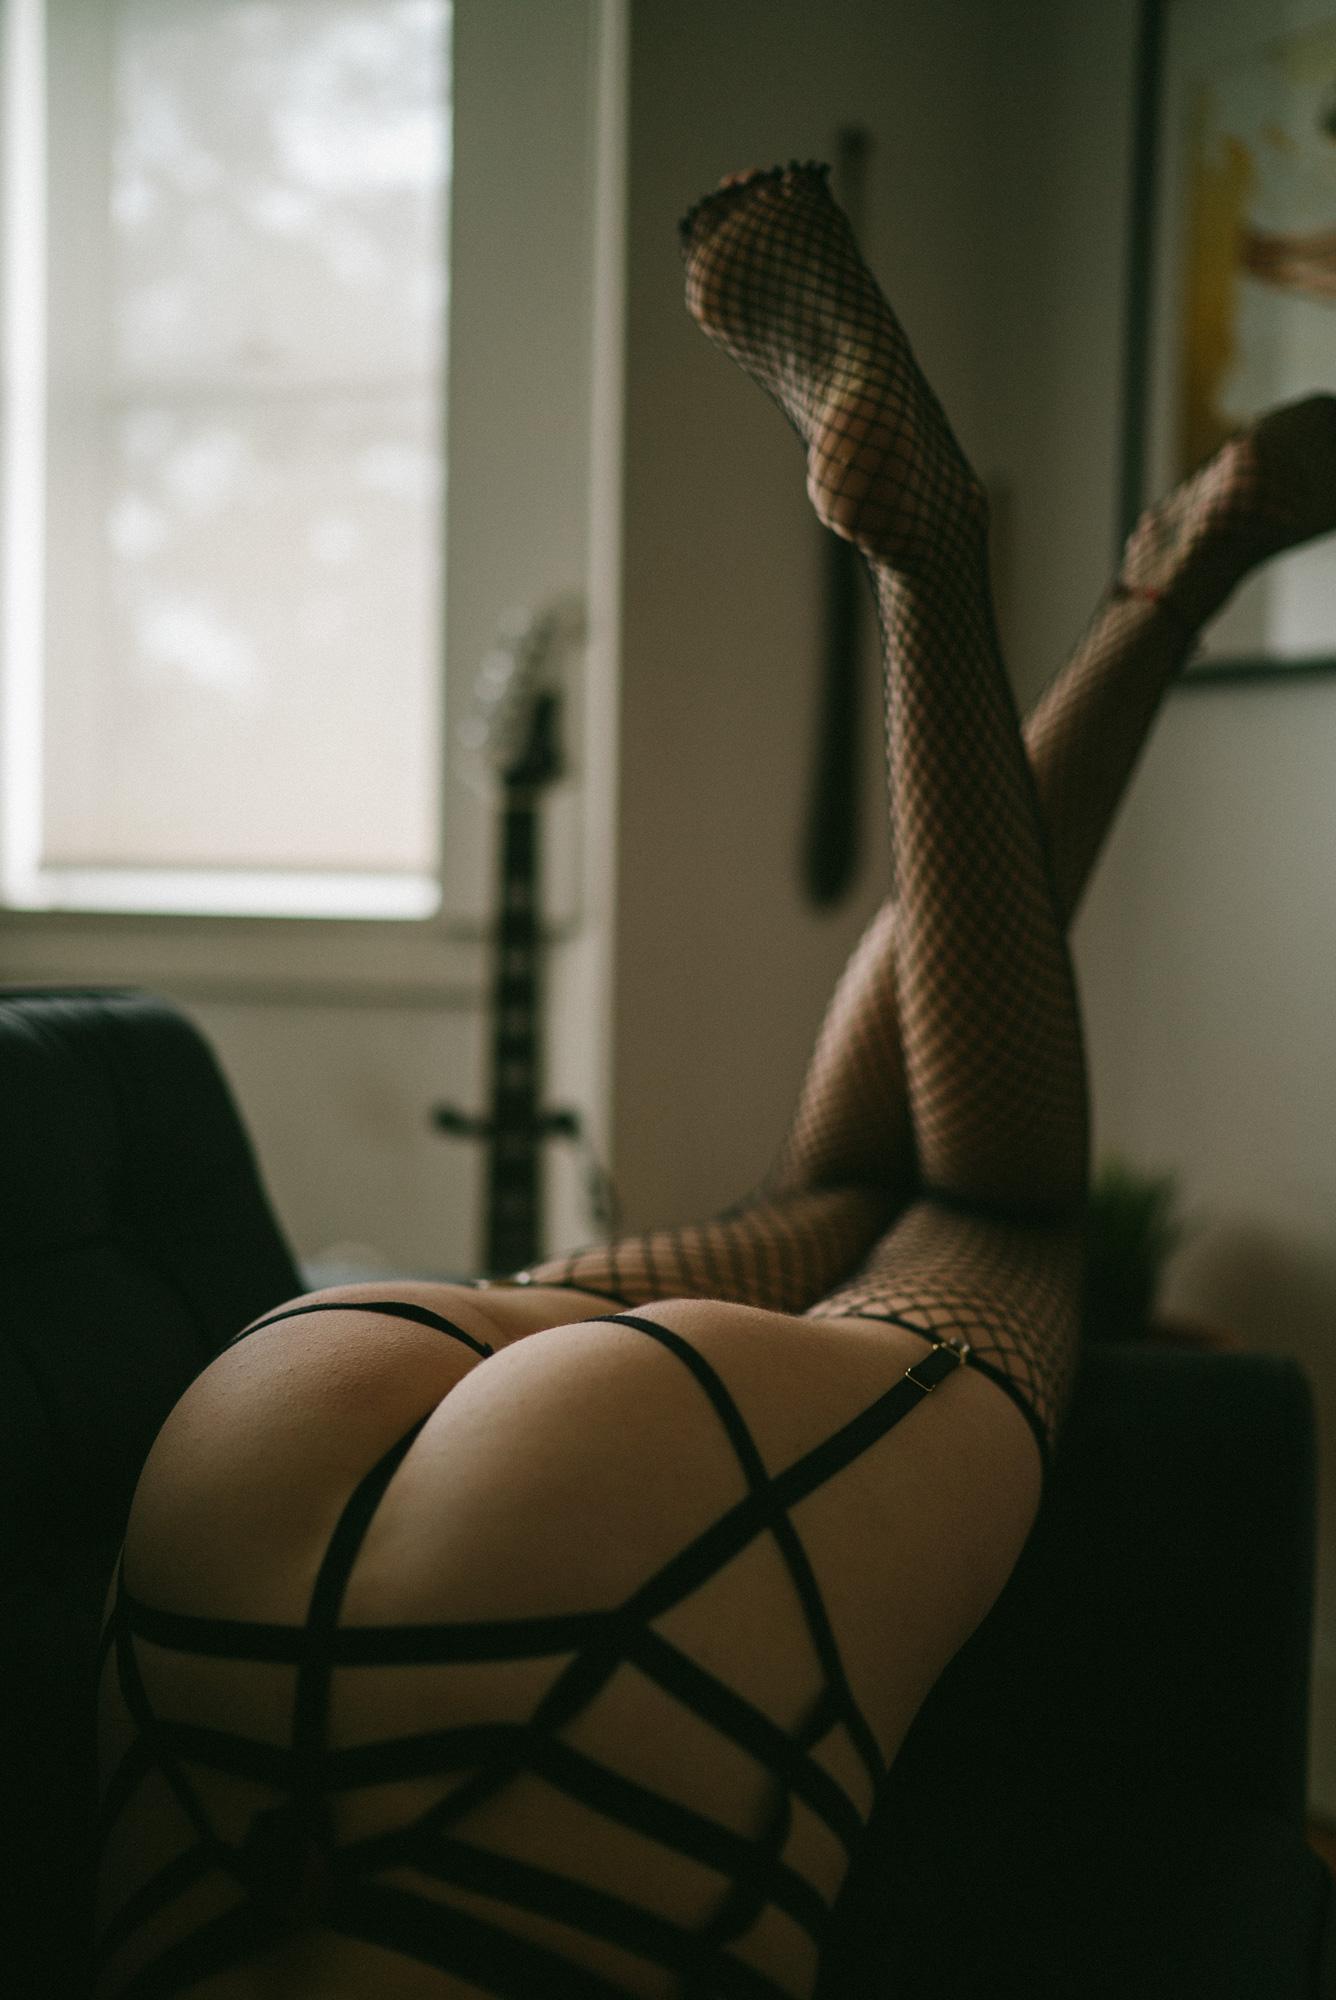 sophie_justinfox_bum_stockings